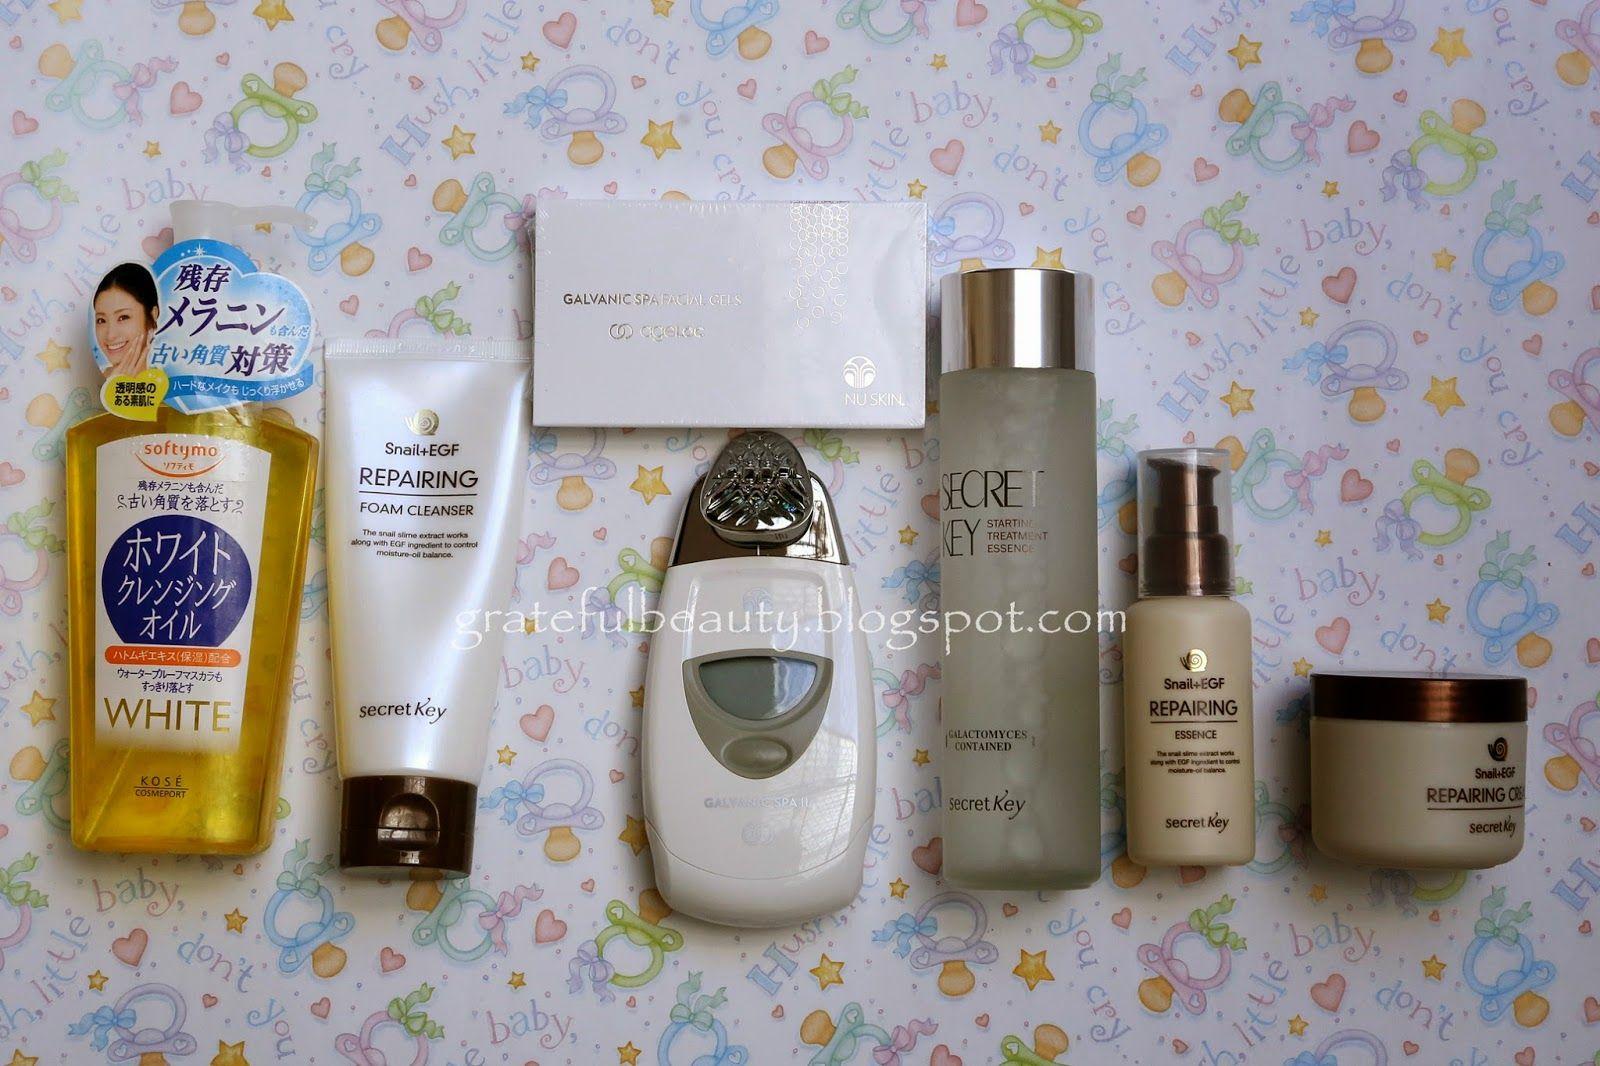 GratefulBeauty [Story of Acne] Skincare untuk kulit